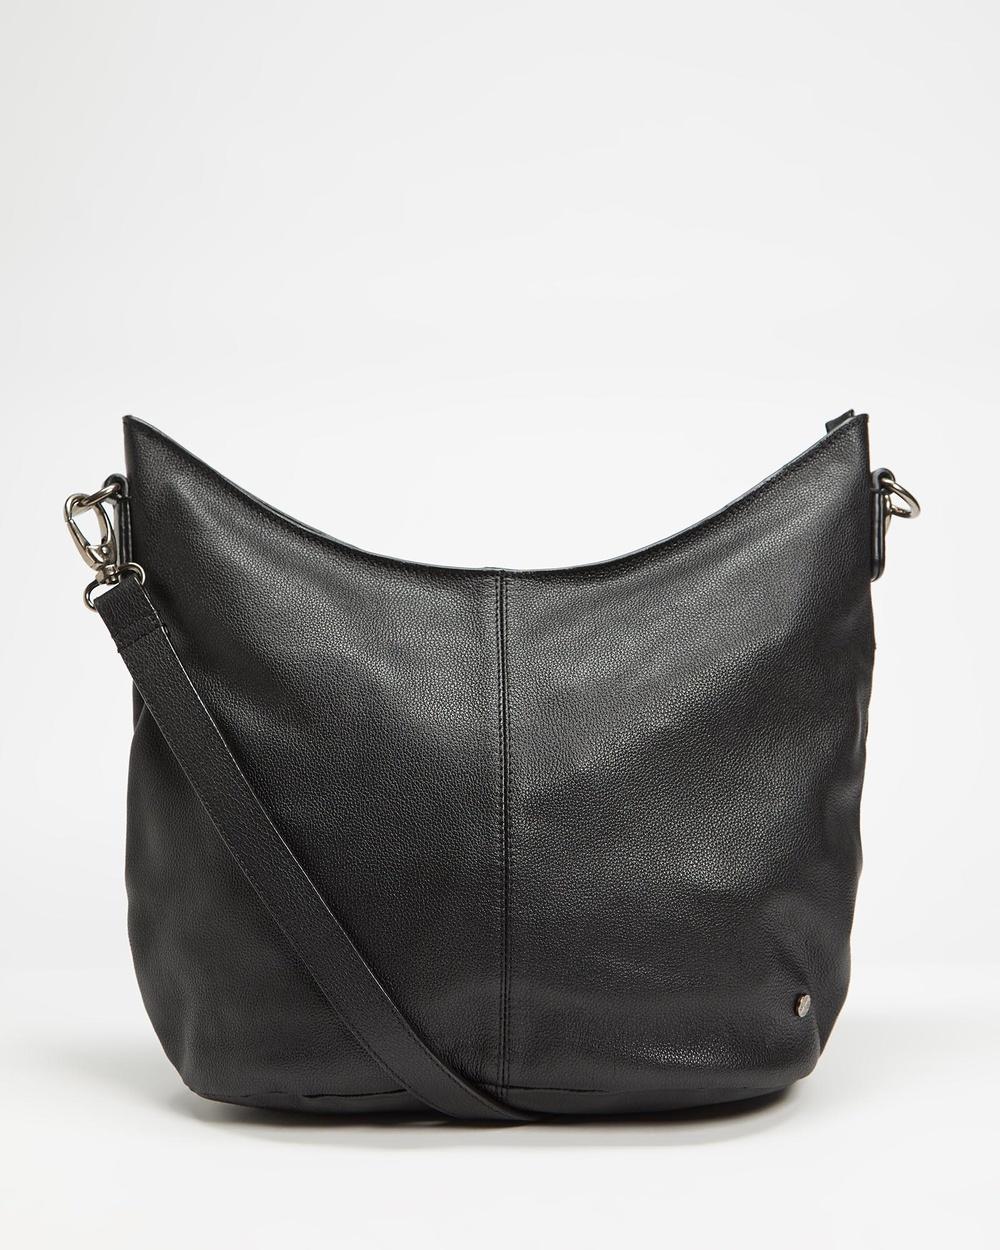 Stitch & Hide Frankie Hobo Bag Handbags Black Australia